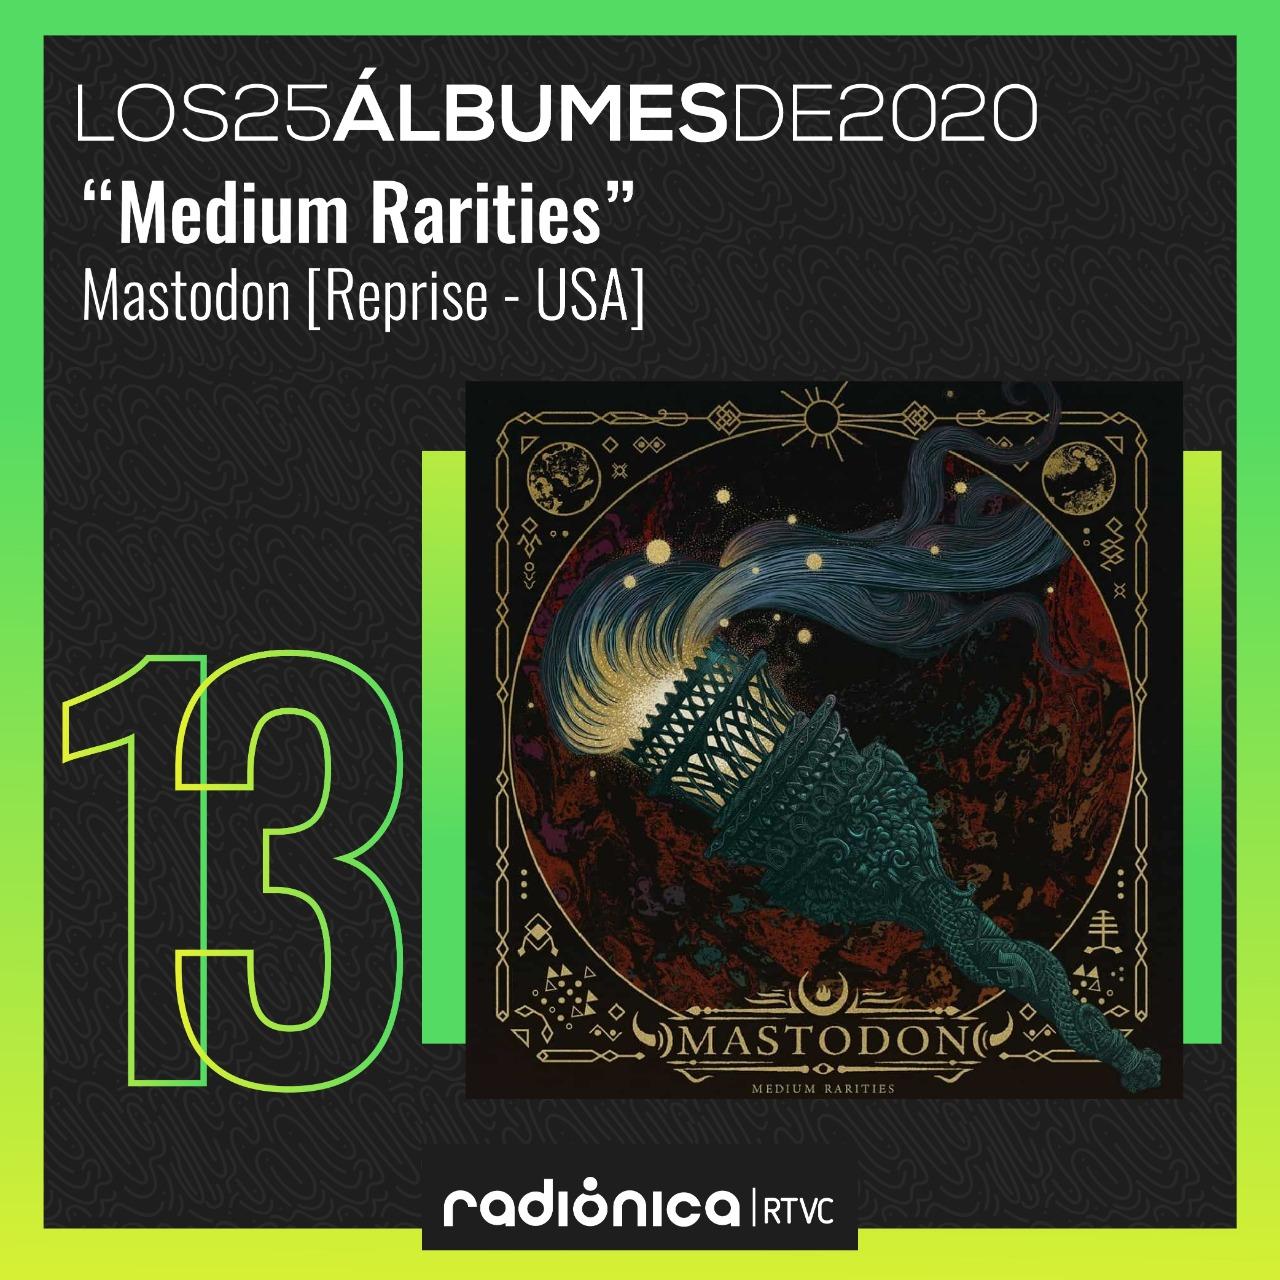 Medium Rarities de Mastodon